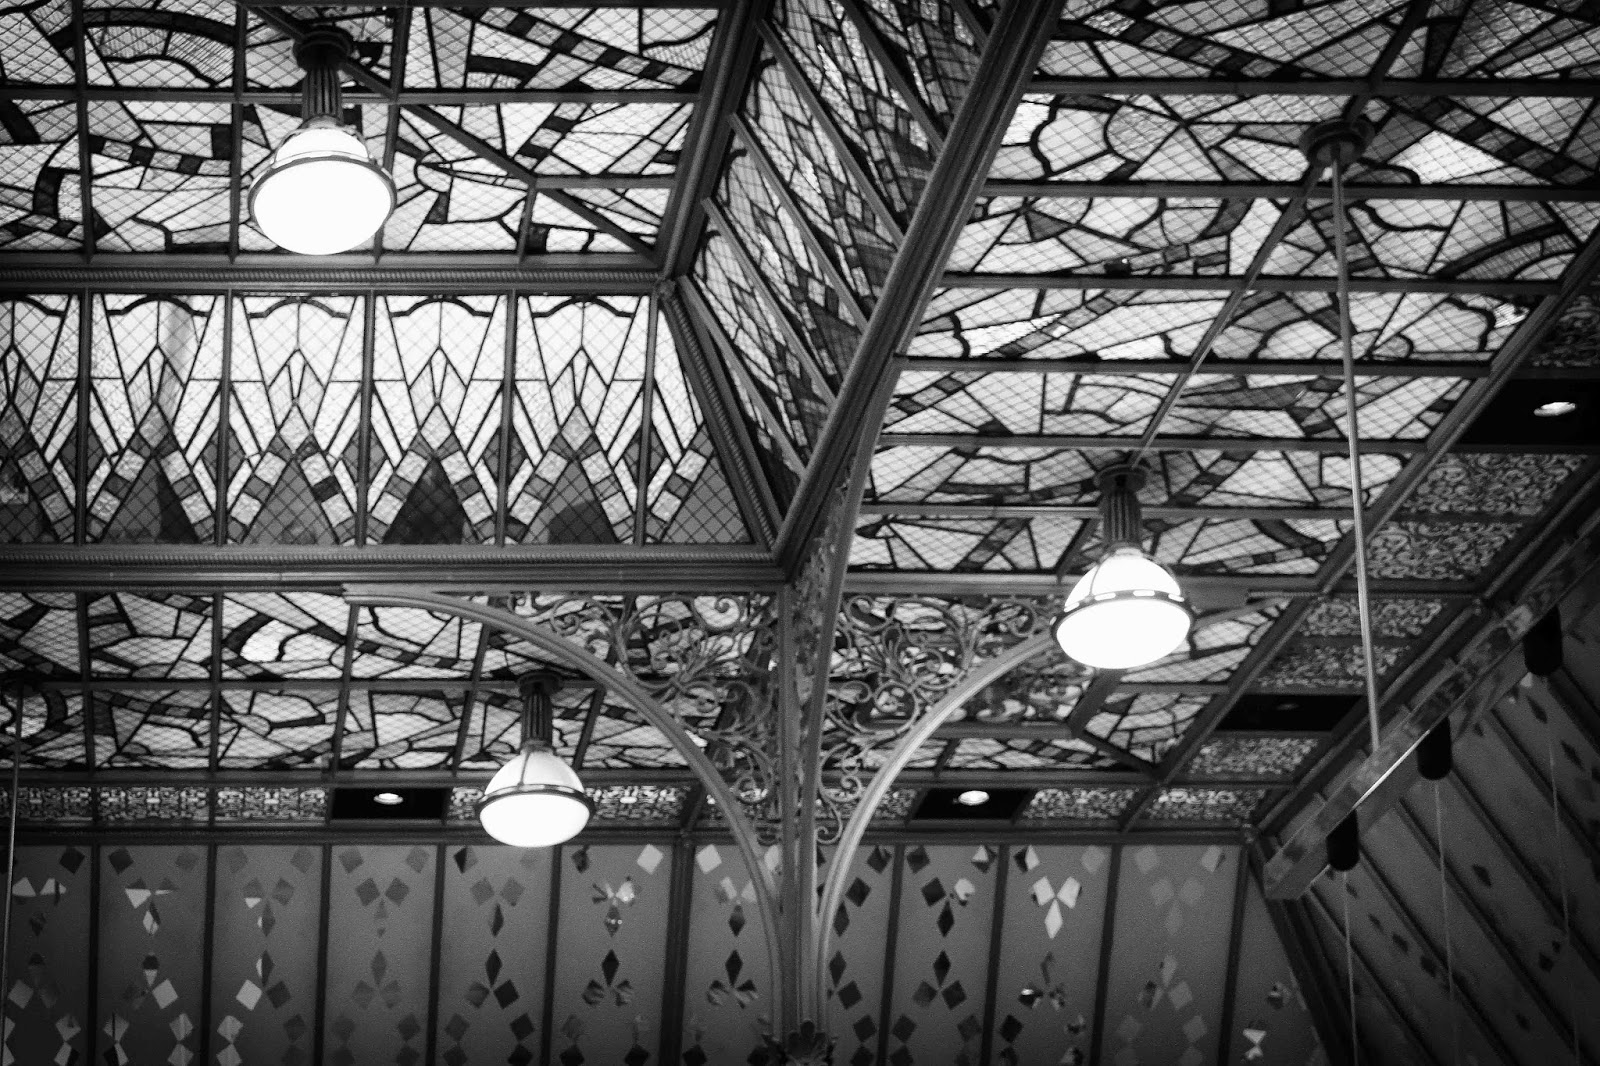 Paris fvdv: de glazen koepels van het nouveau paris